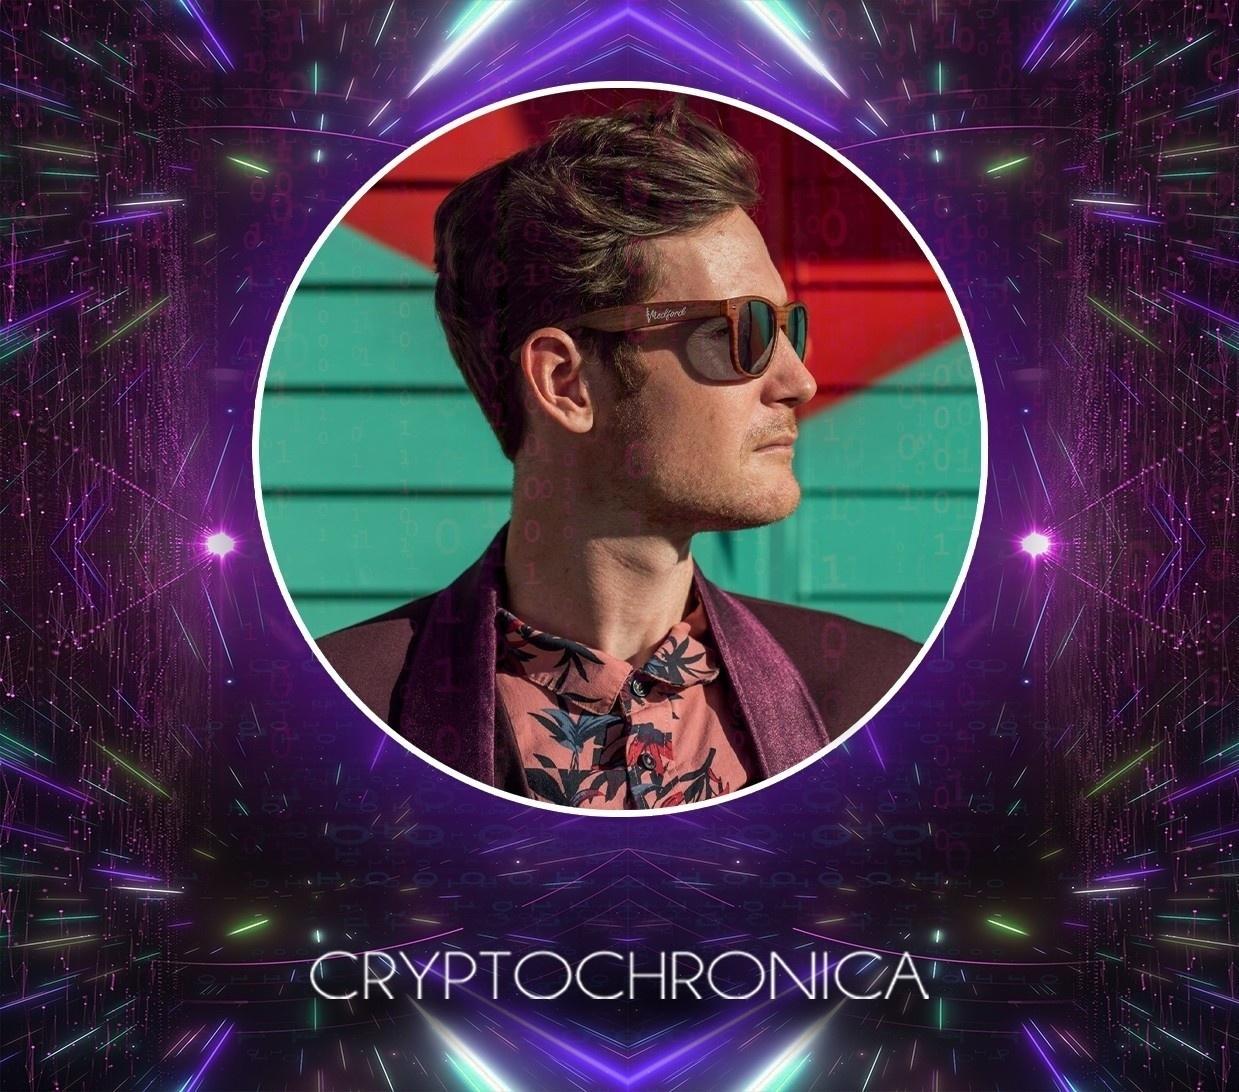 EDM artist Cryptochronica at the Producer Dojo music label.